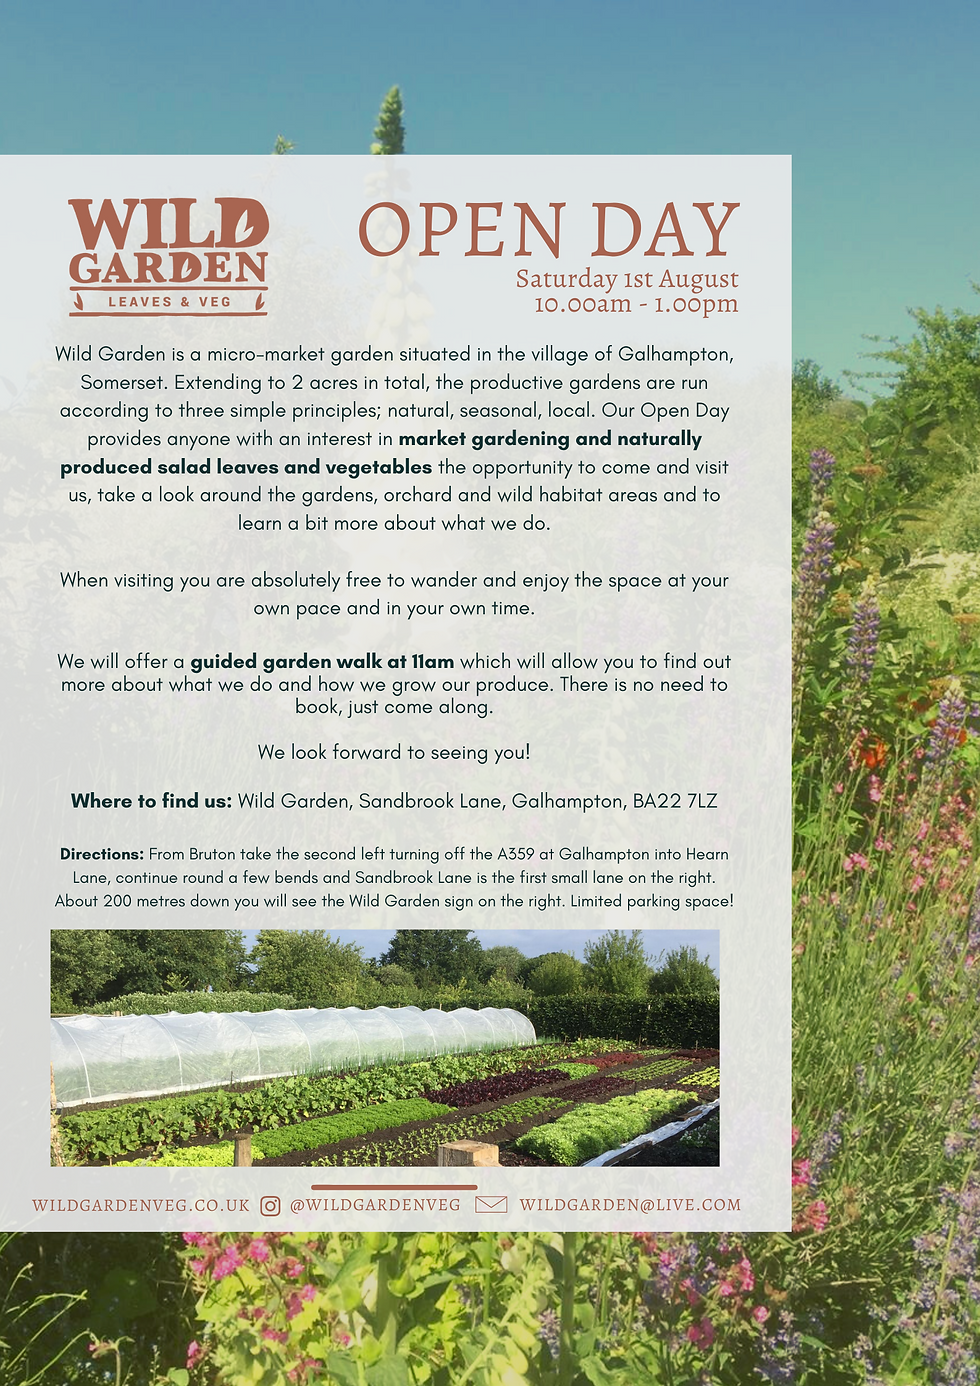 Wild Garden OPEN DAY 25_07_20.png